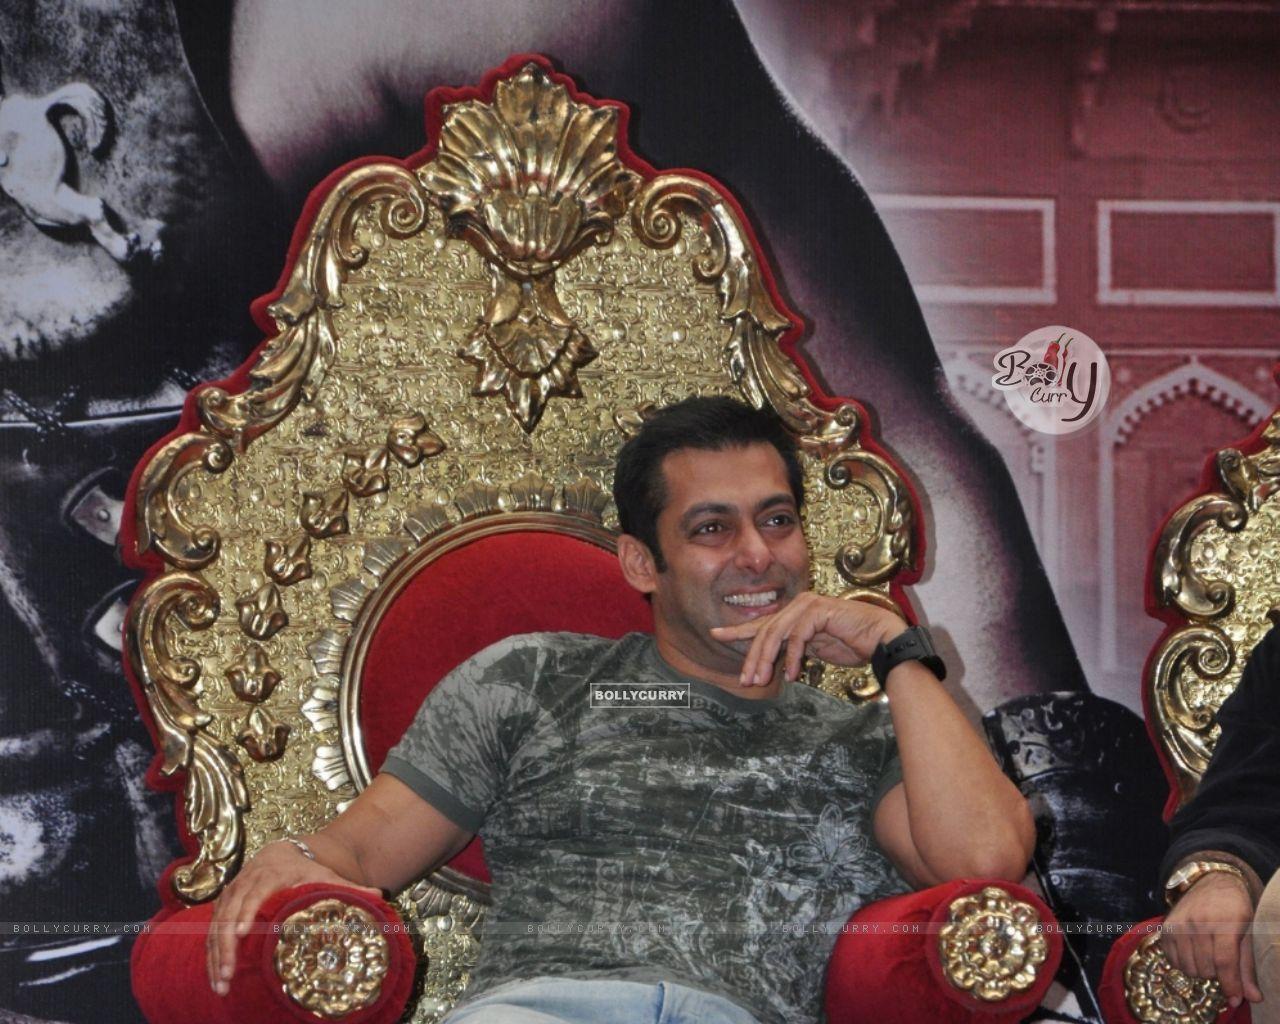 Wallpaper - Salman Khan with Kids at